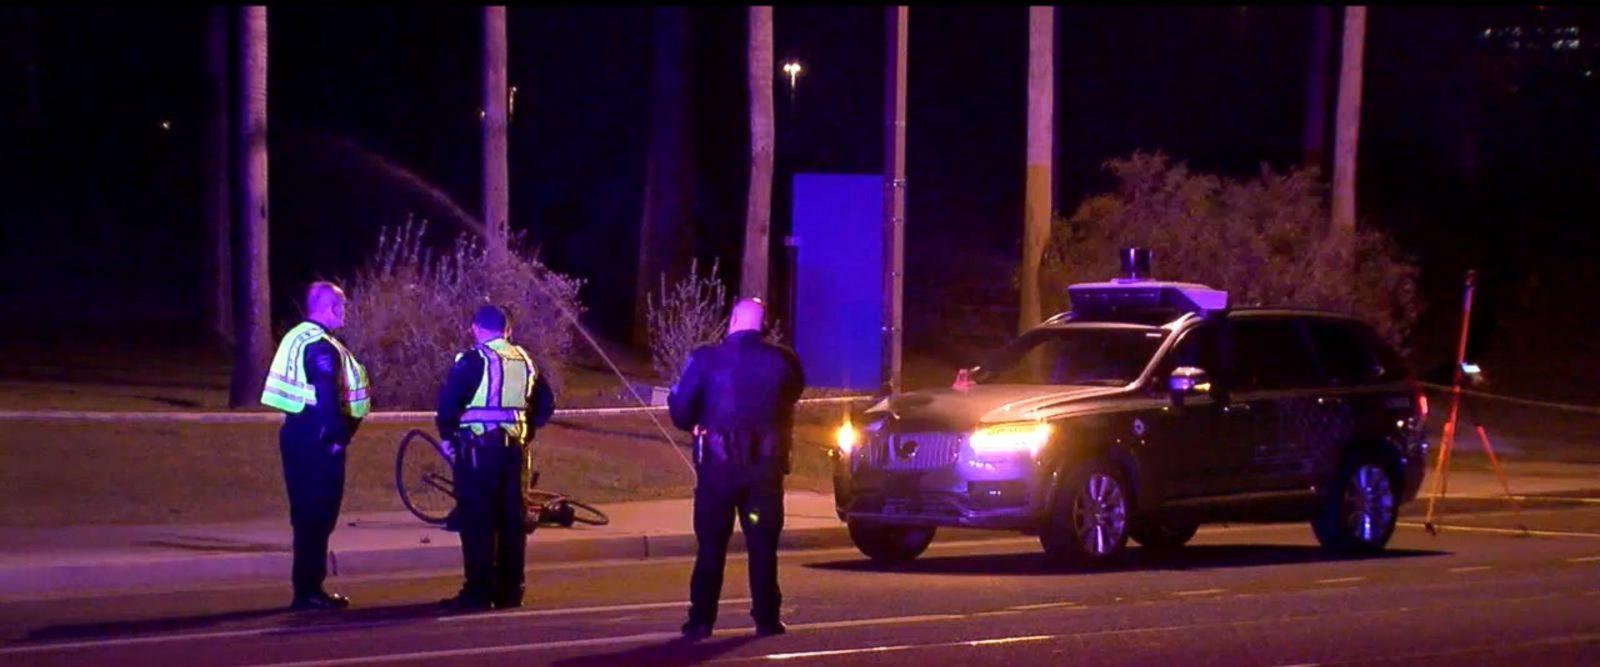 VIDEO: NTSB to probe deadly crash involving self-driving car